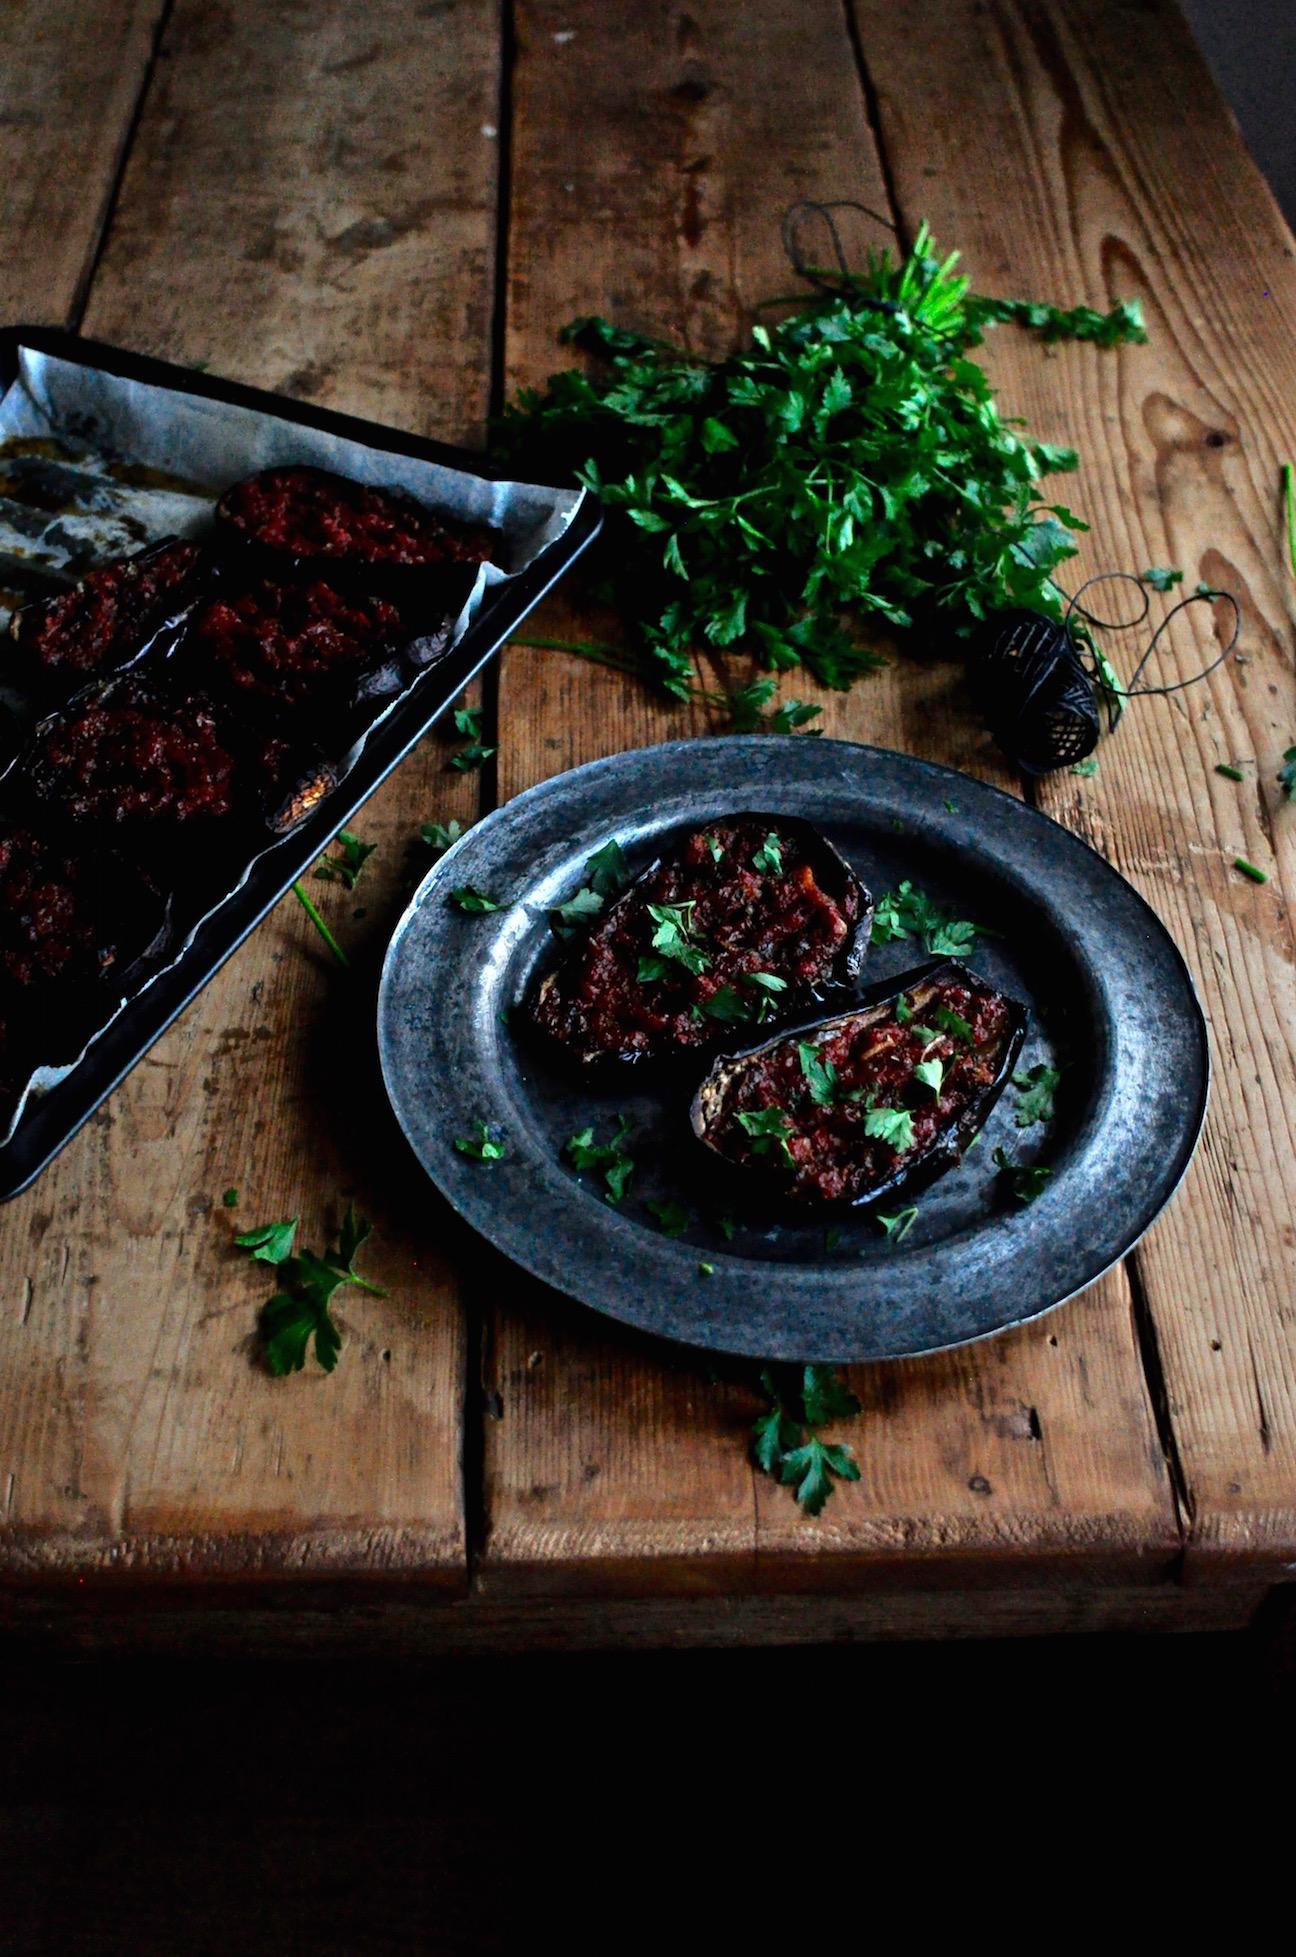 imambaildi_kitchenhabitscom6